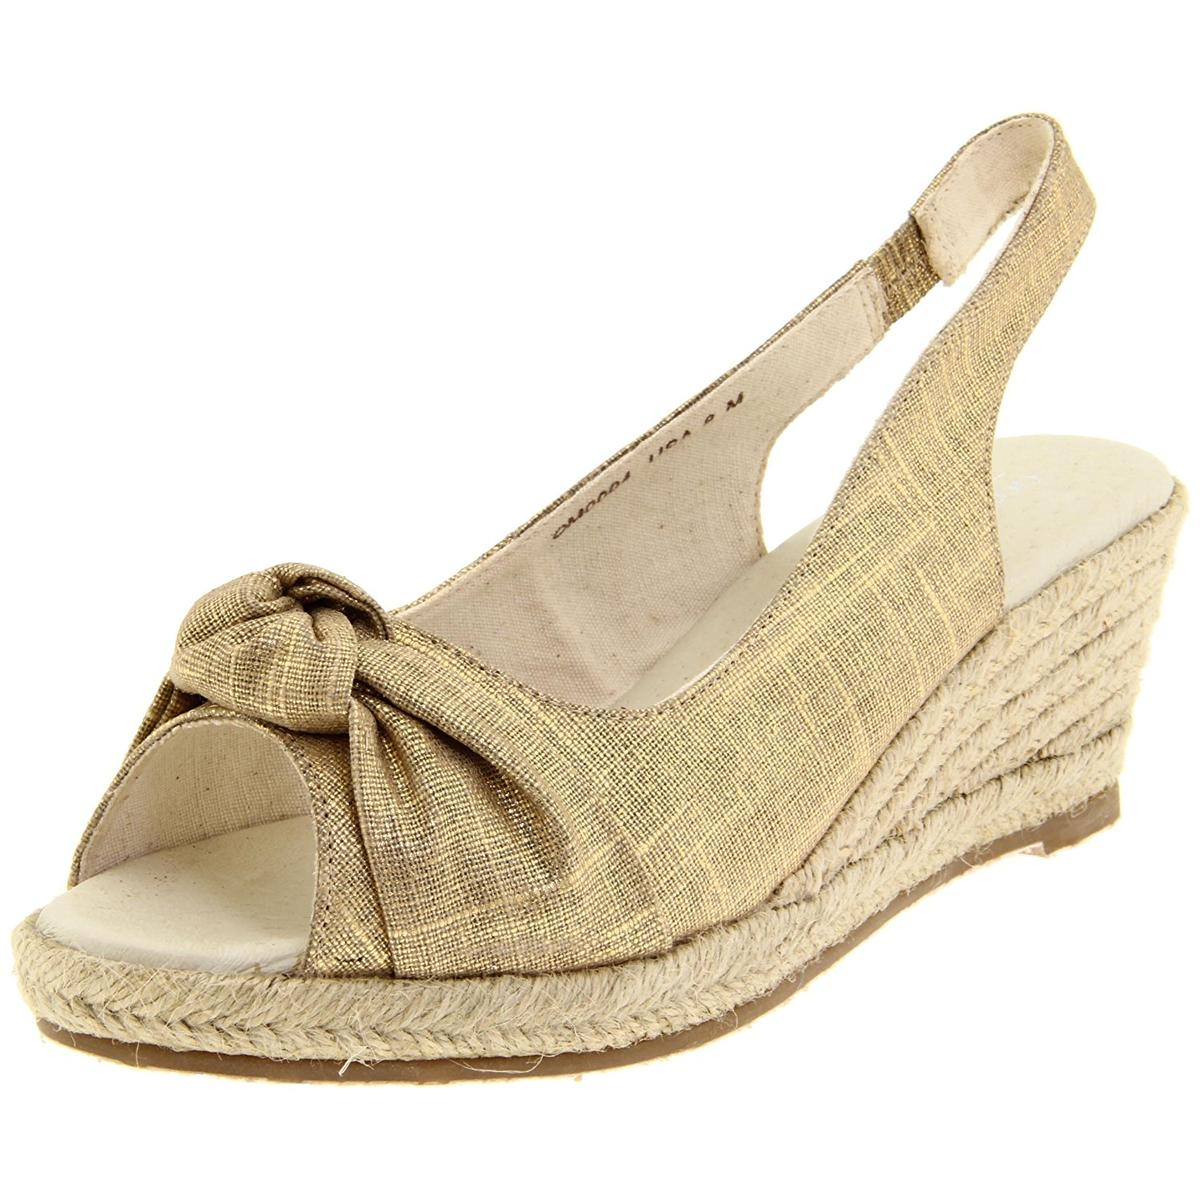 Lamo OM0004 Womens Gold Sandals by Lamo